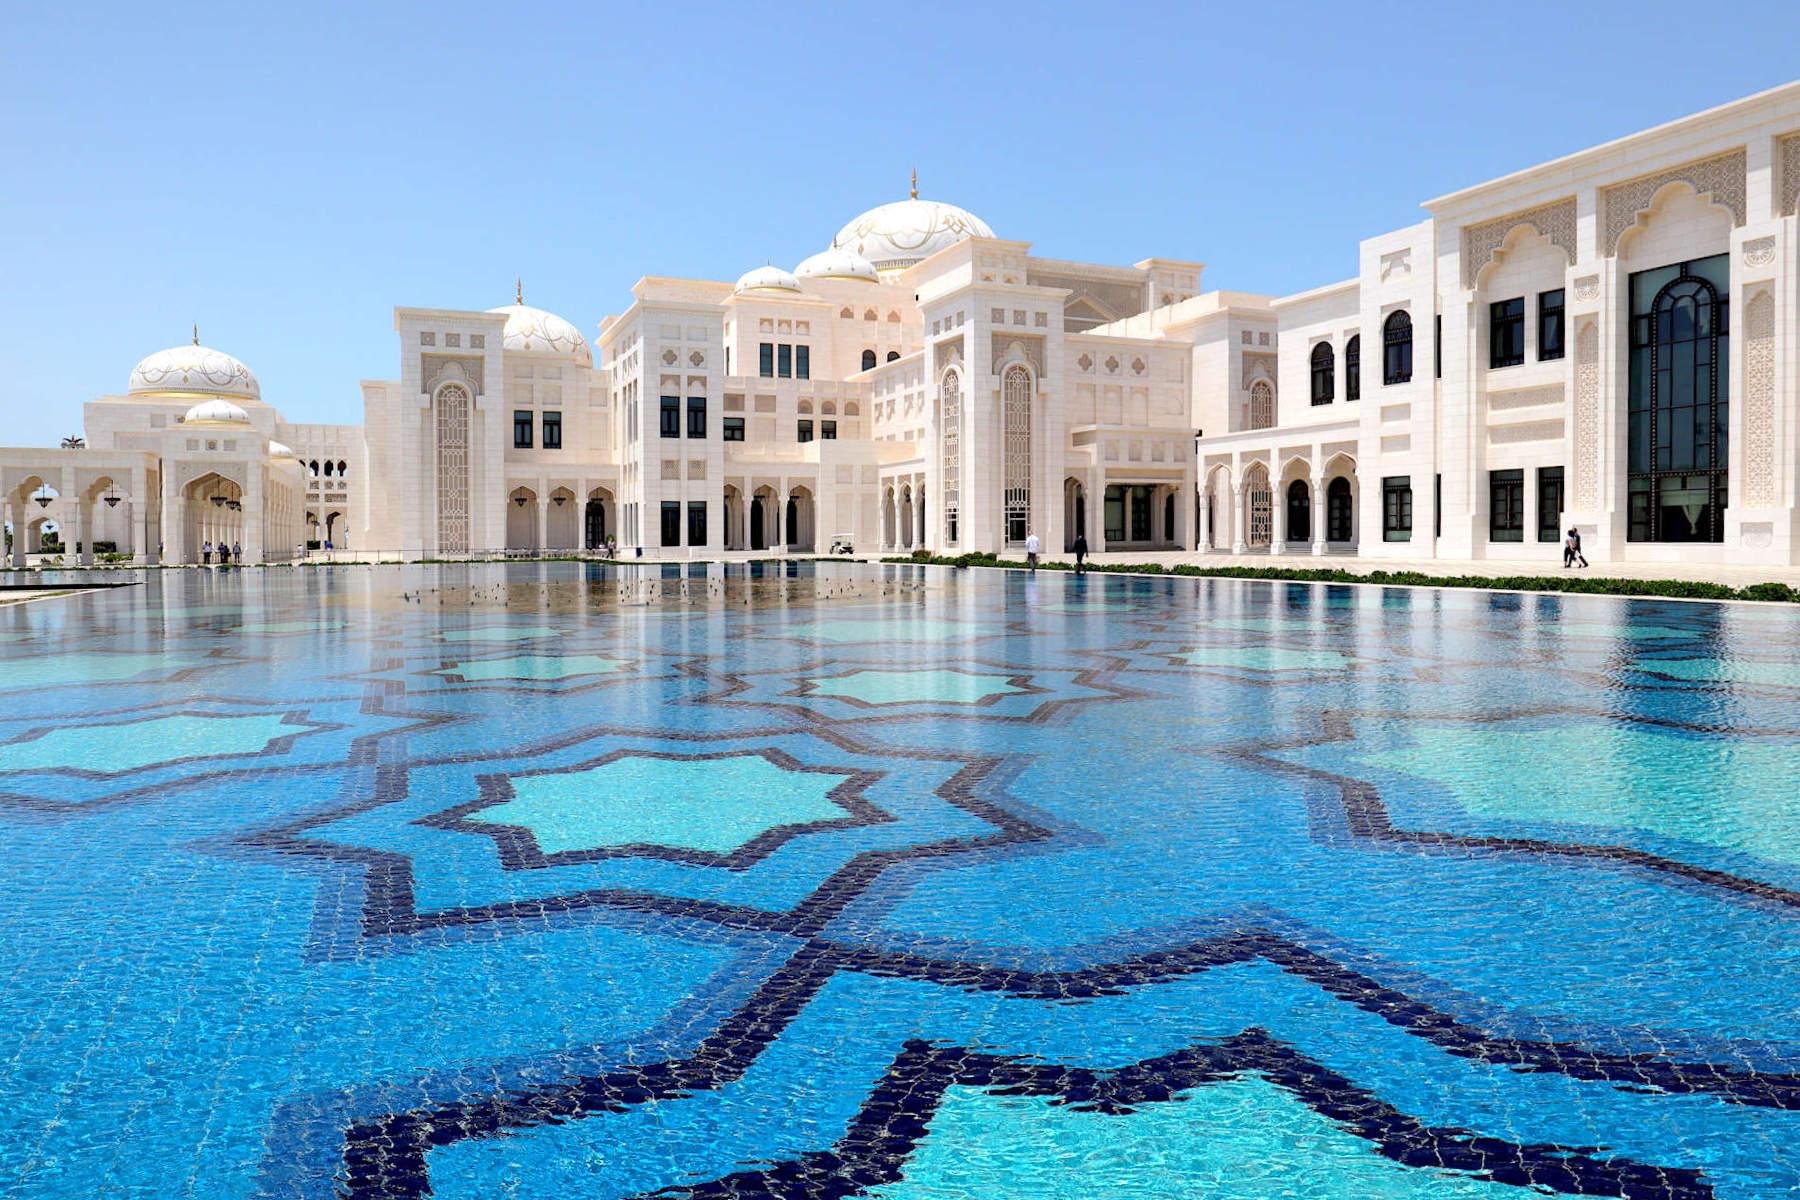 Qasr Al Watan. Entwurf: Gulf House Engineering (GHE), Bahrain. Fertigstellung: 2016.